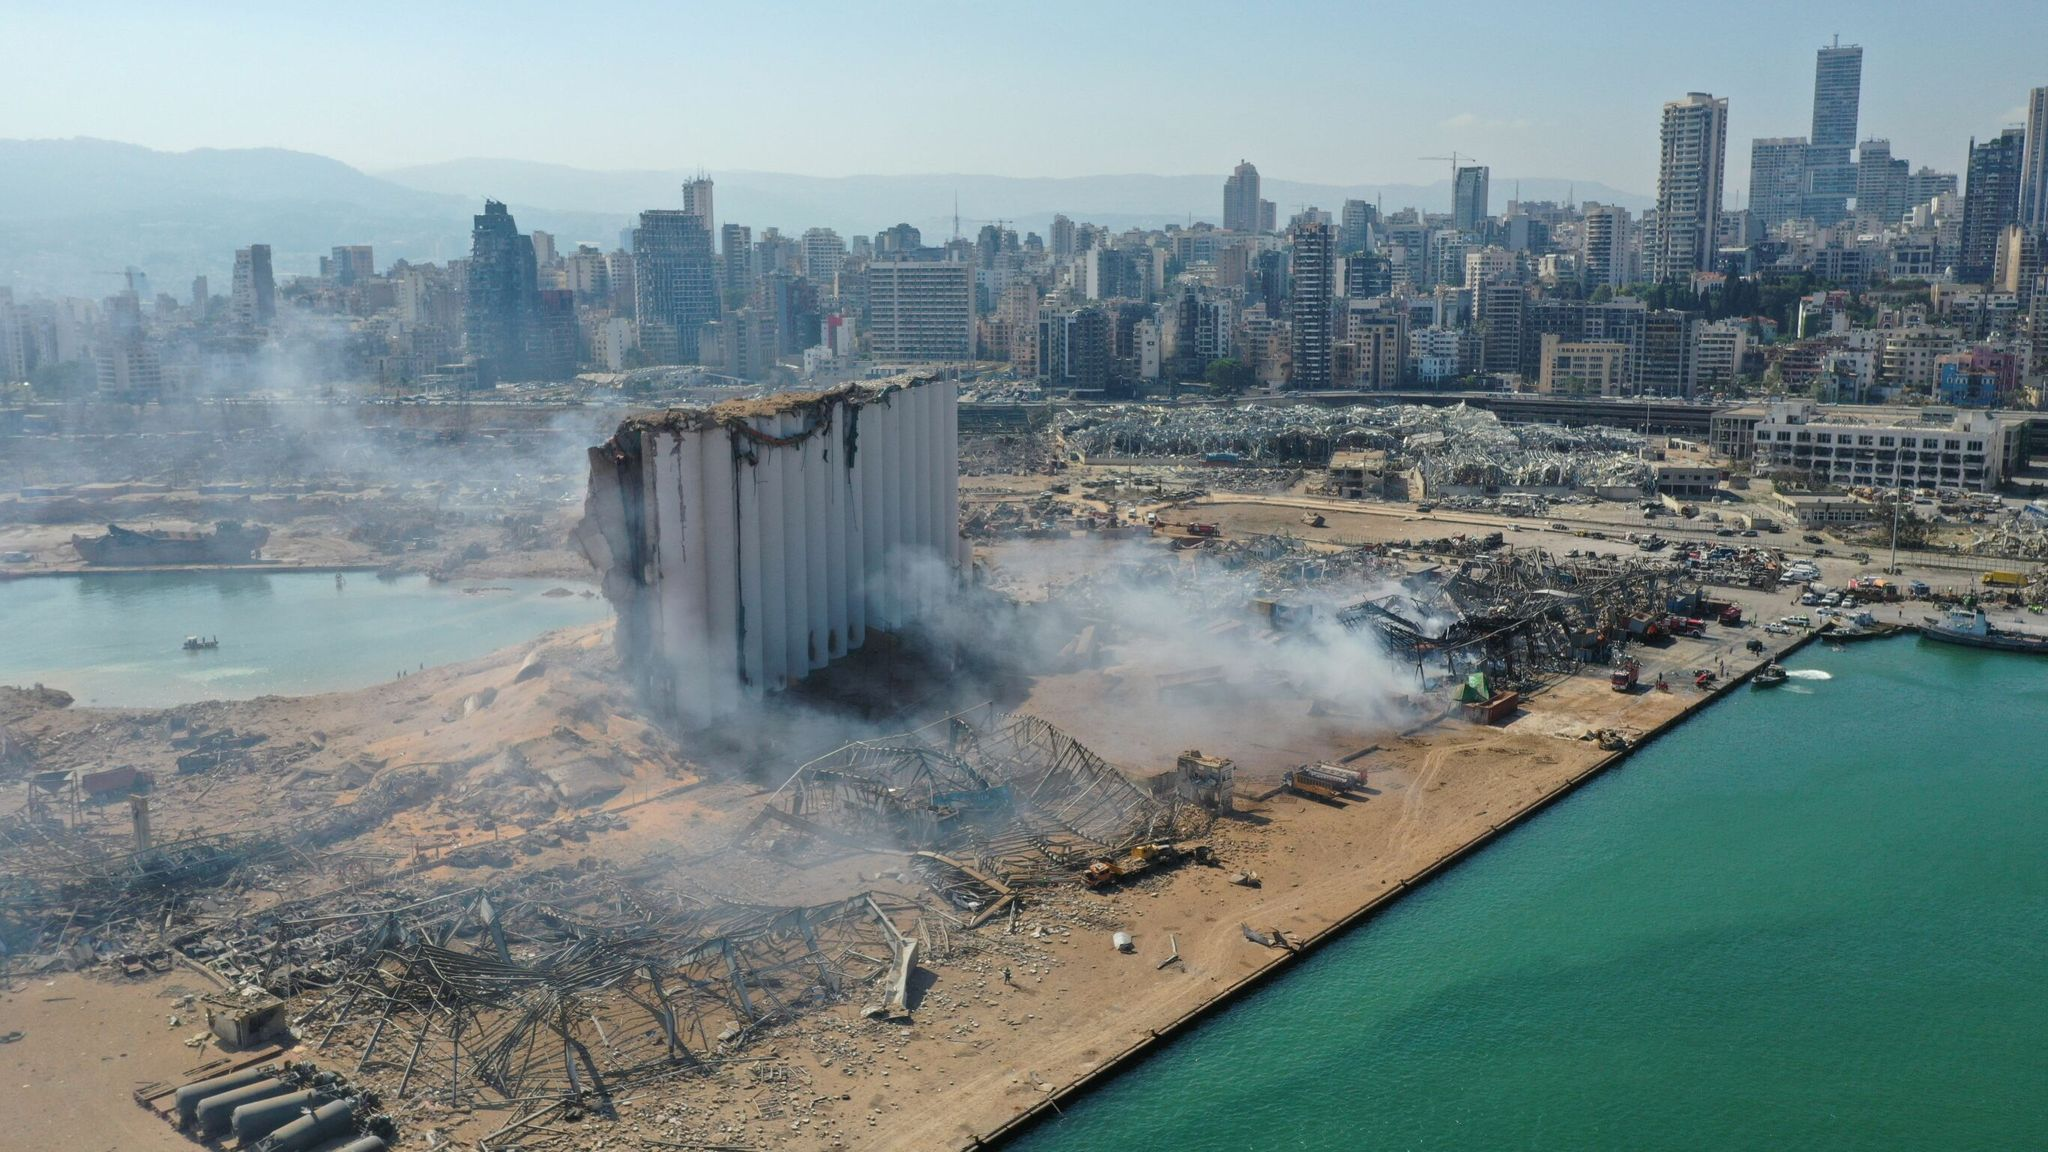 explosion en beirut libano Sky News